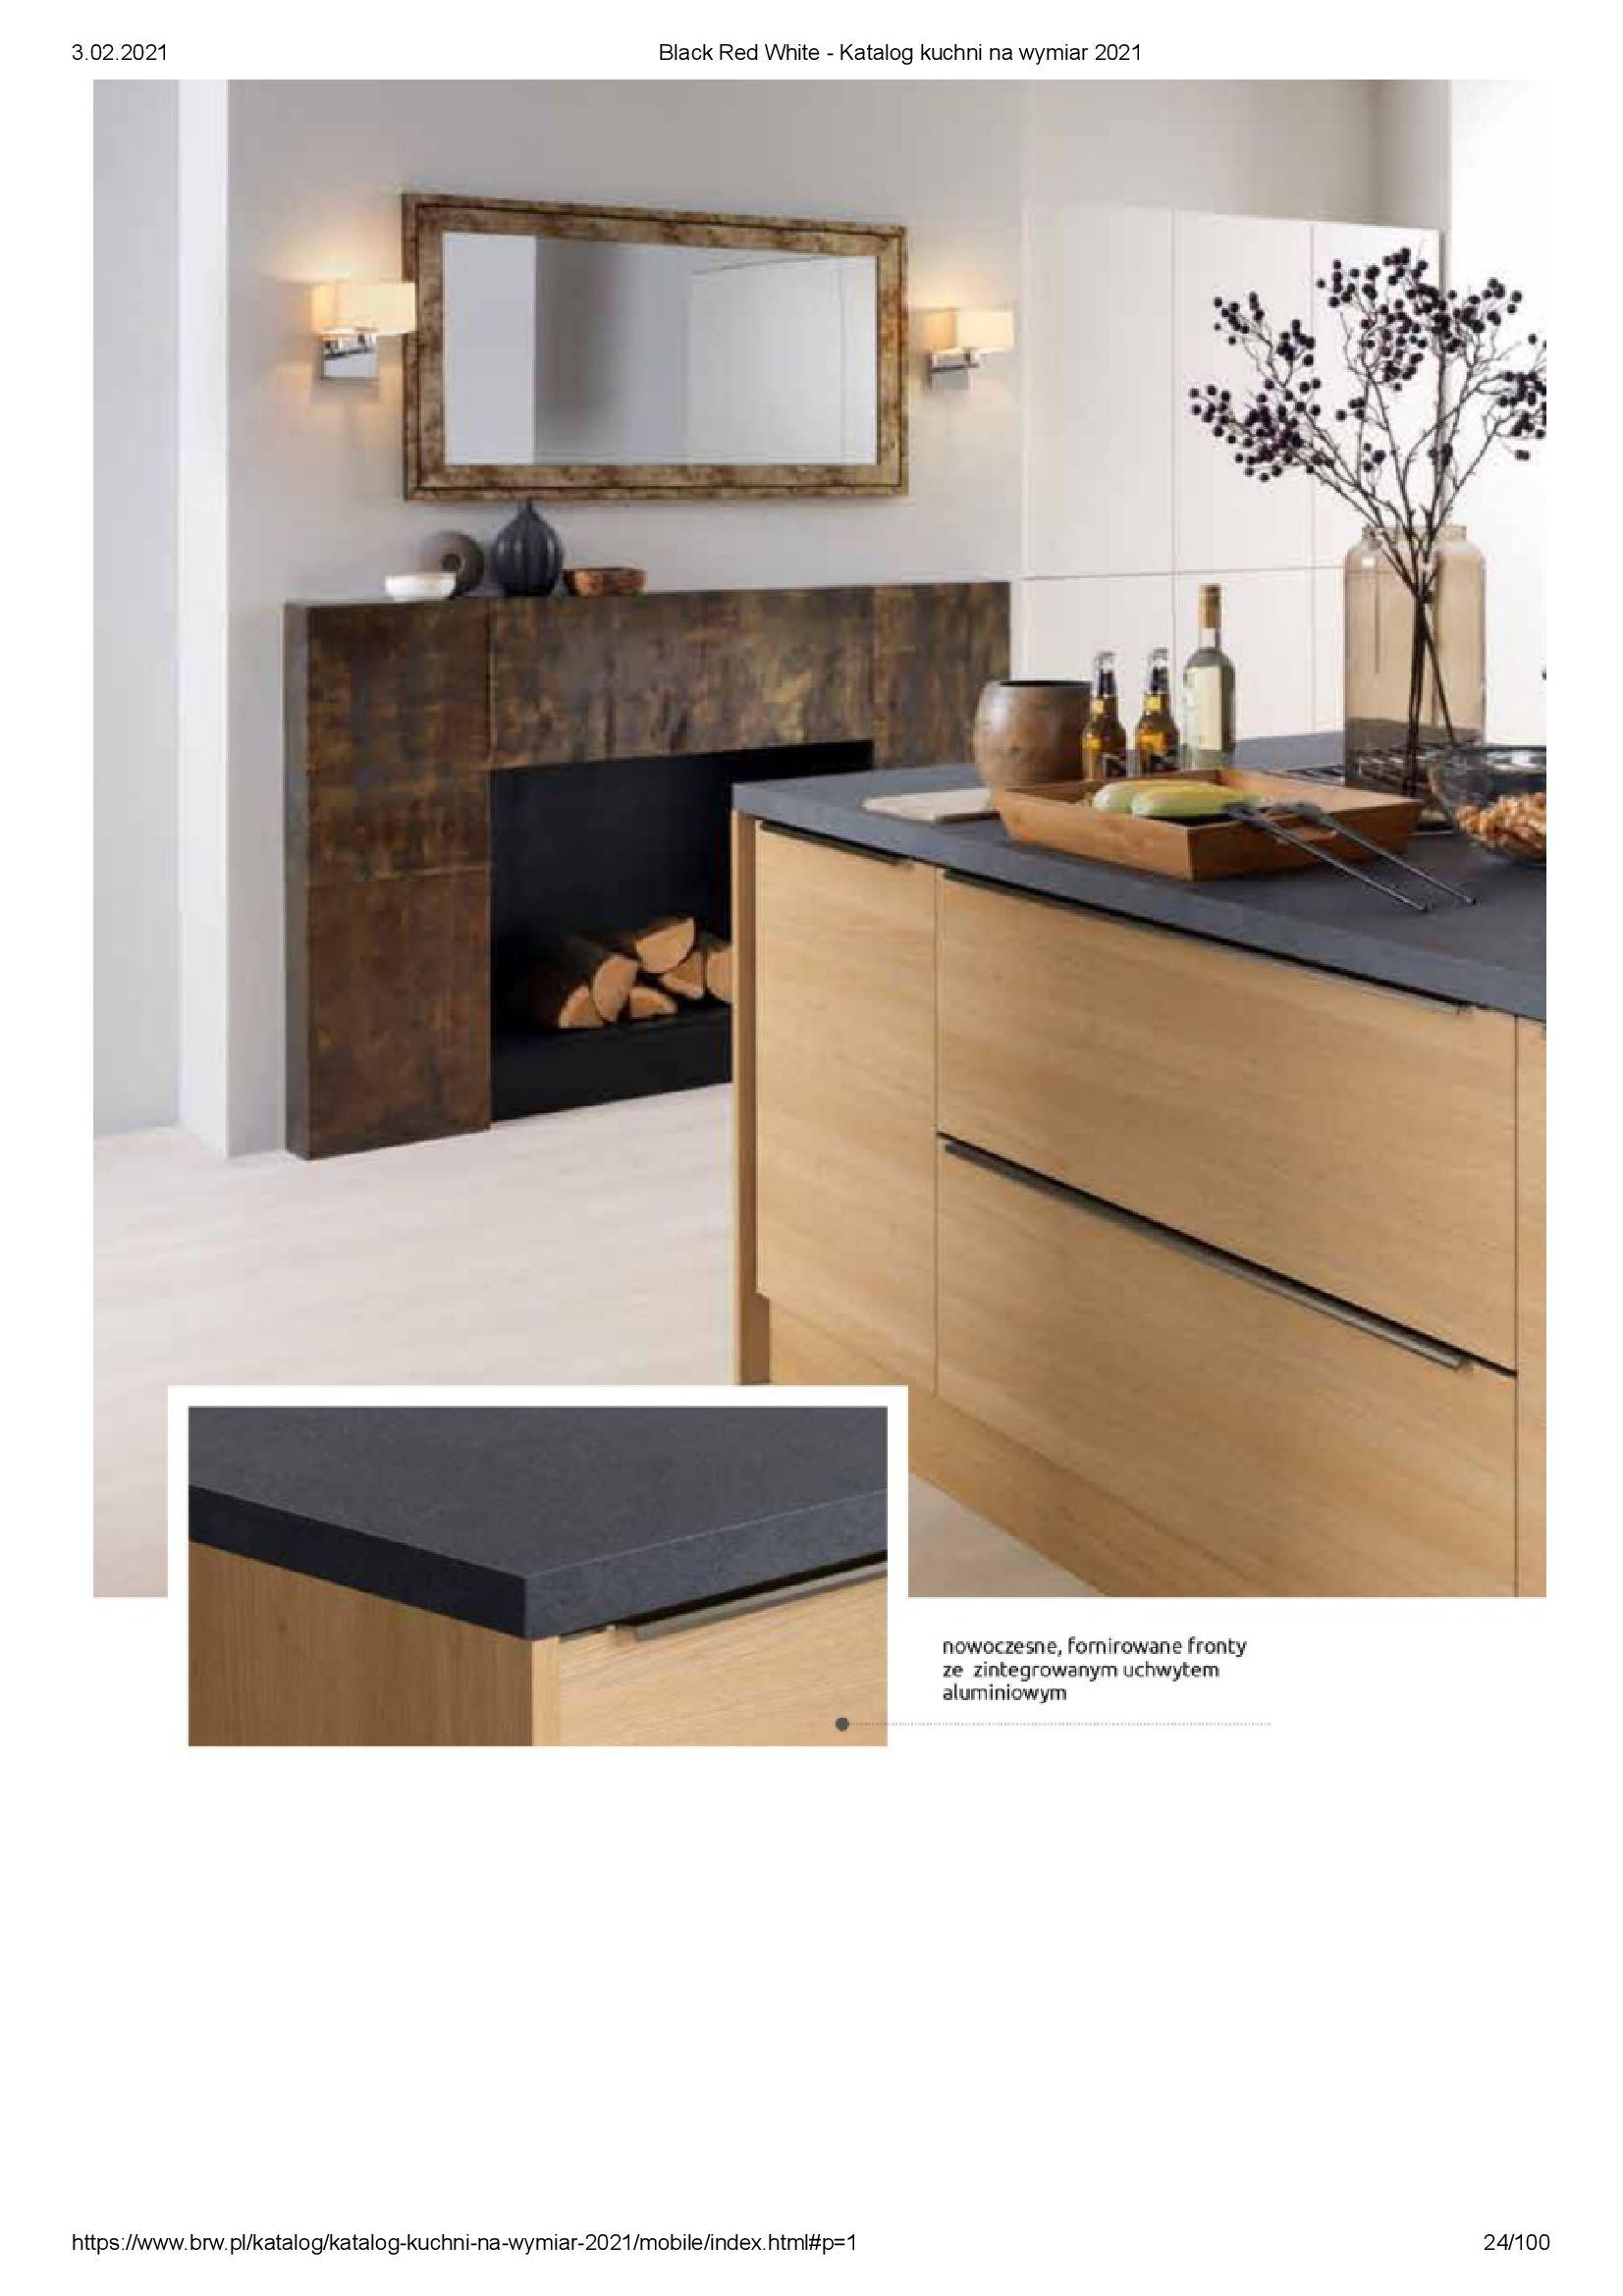 Gazetka Black Red White: Katalog - Kuchnie na wymiar Senso Kitchens 2021 2021-01-01 page-24